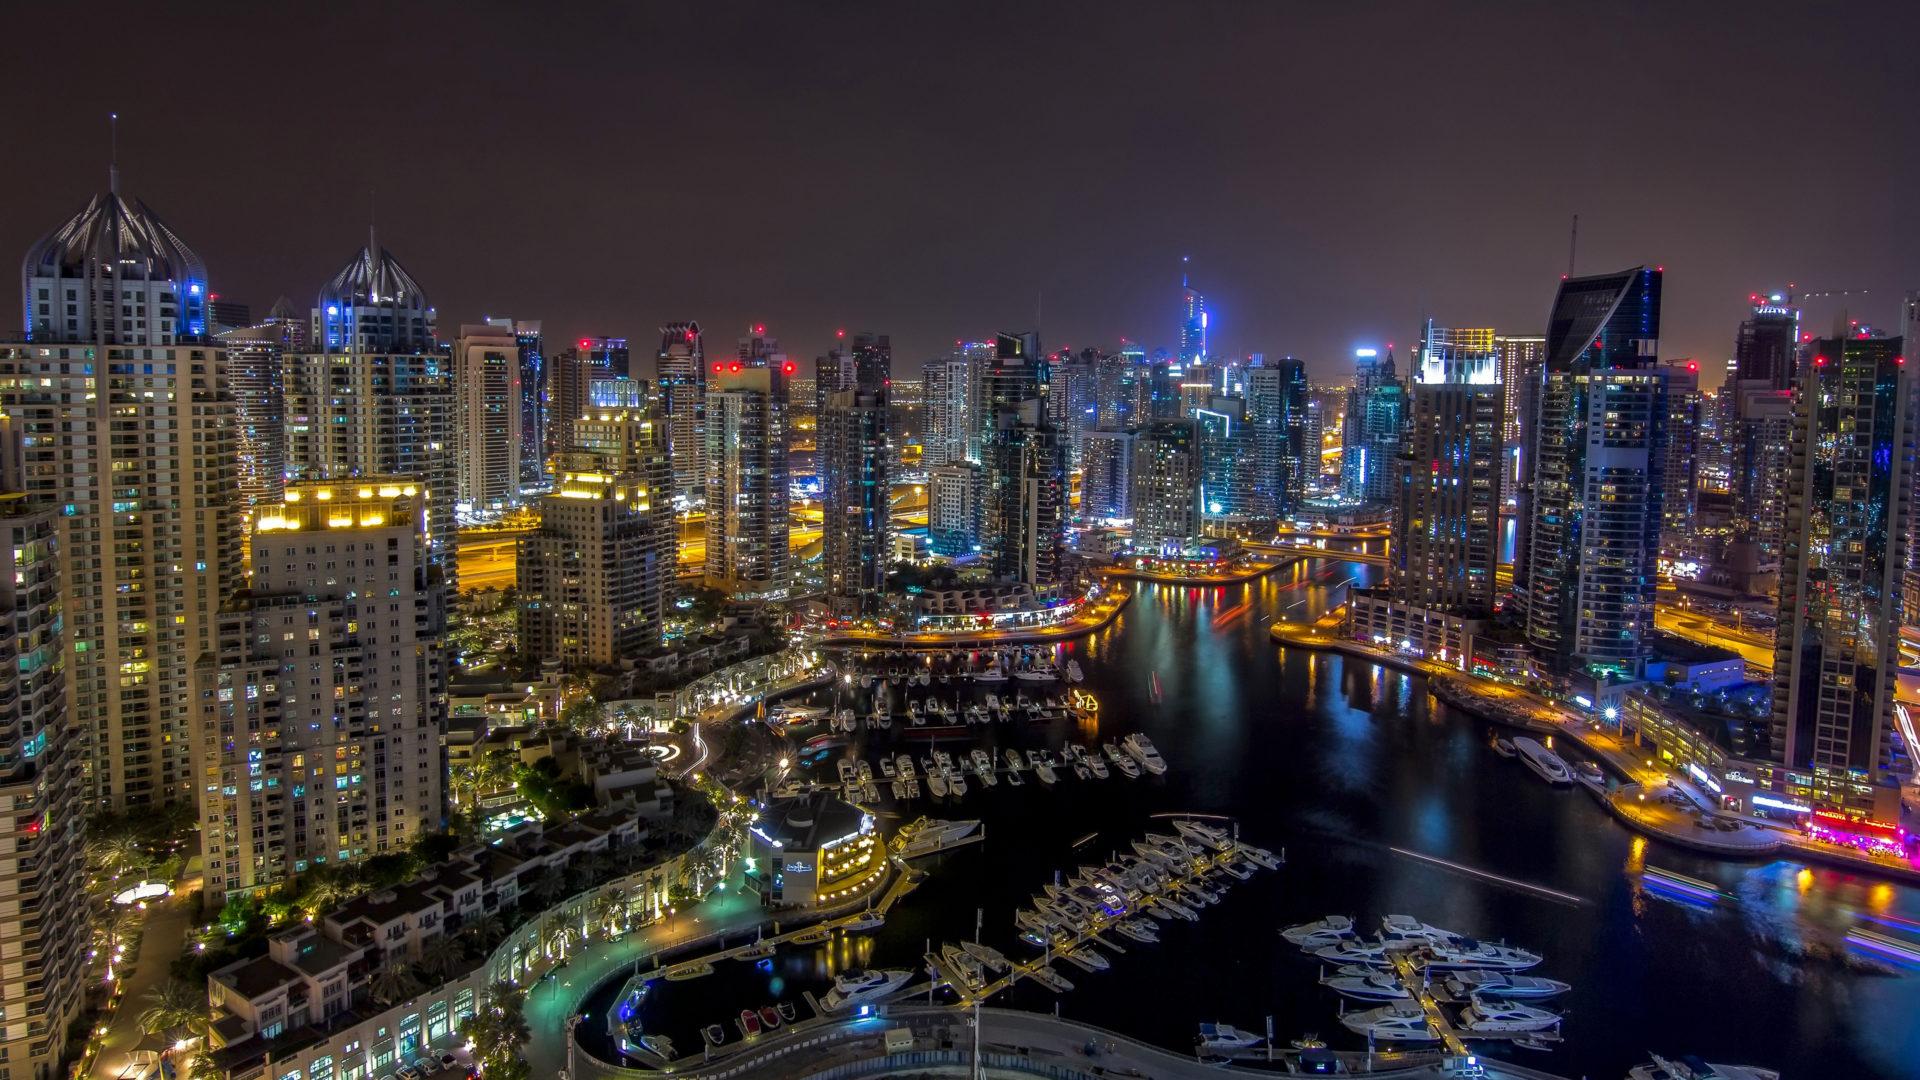 Emirates Wallpaper Hd Dubai Night Wallpaper Hd Buildings Skyscrapers Marina